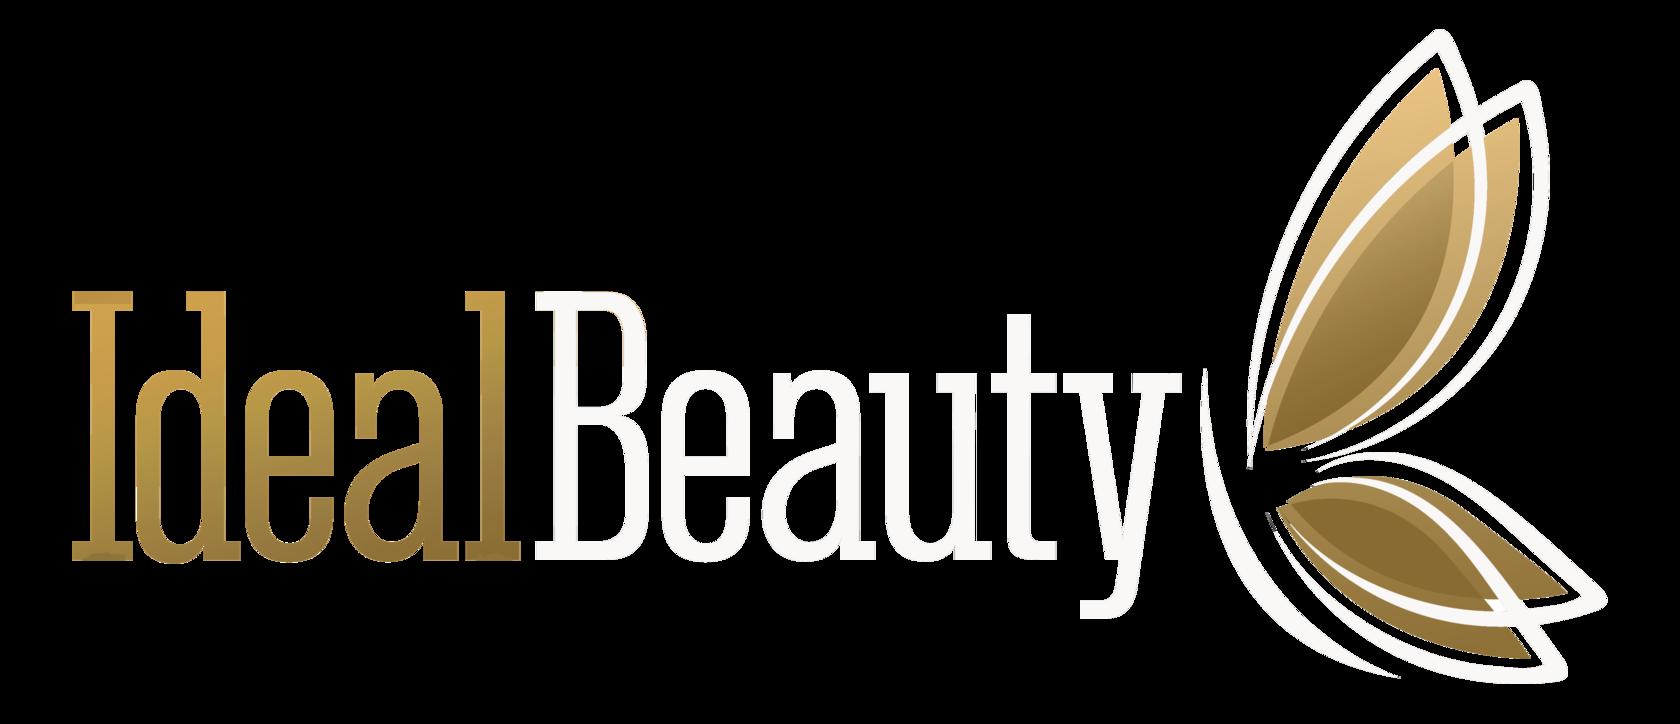 IdealBeauty